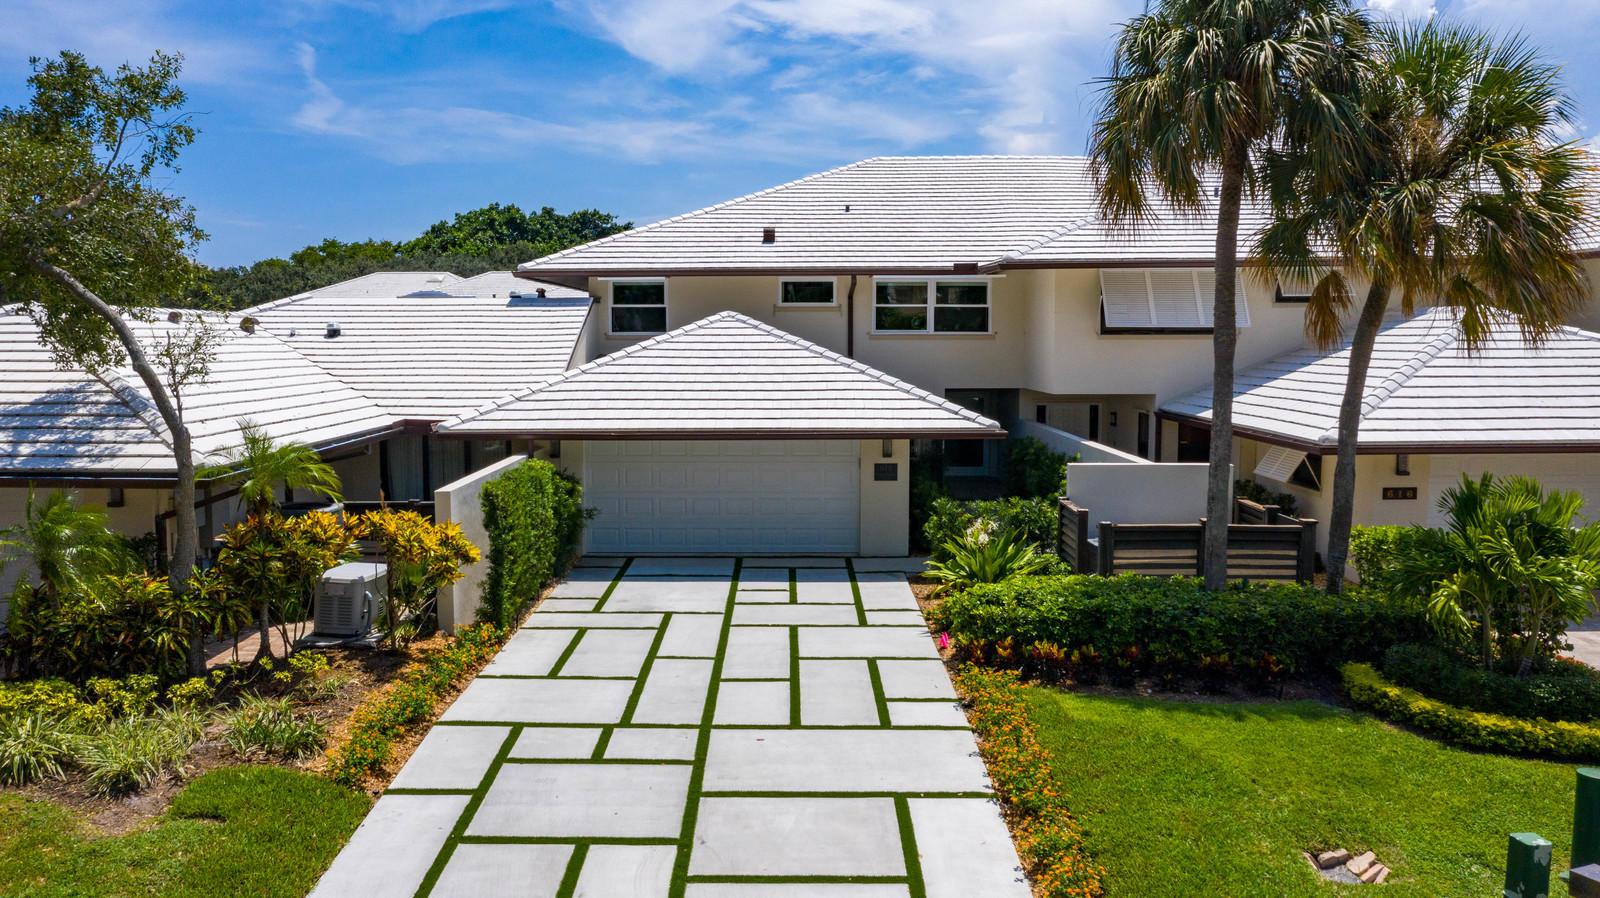 Photo of 618 Boca Marina Court, Boca Raton, FL 33487